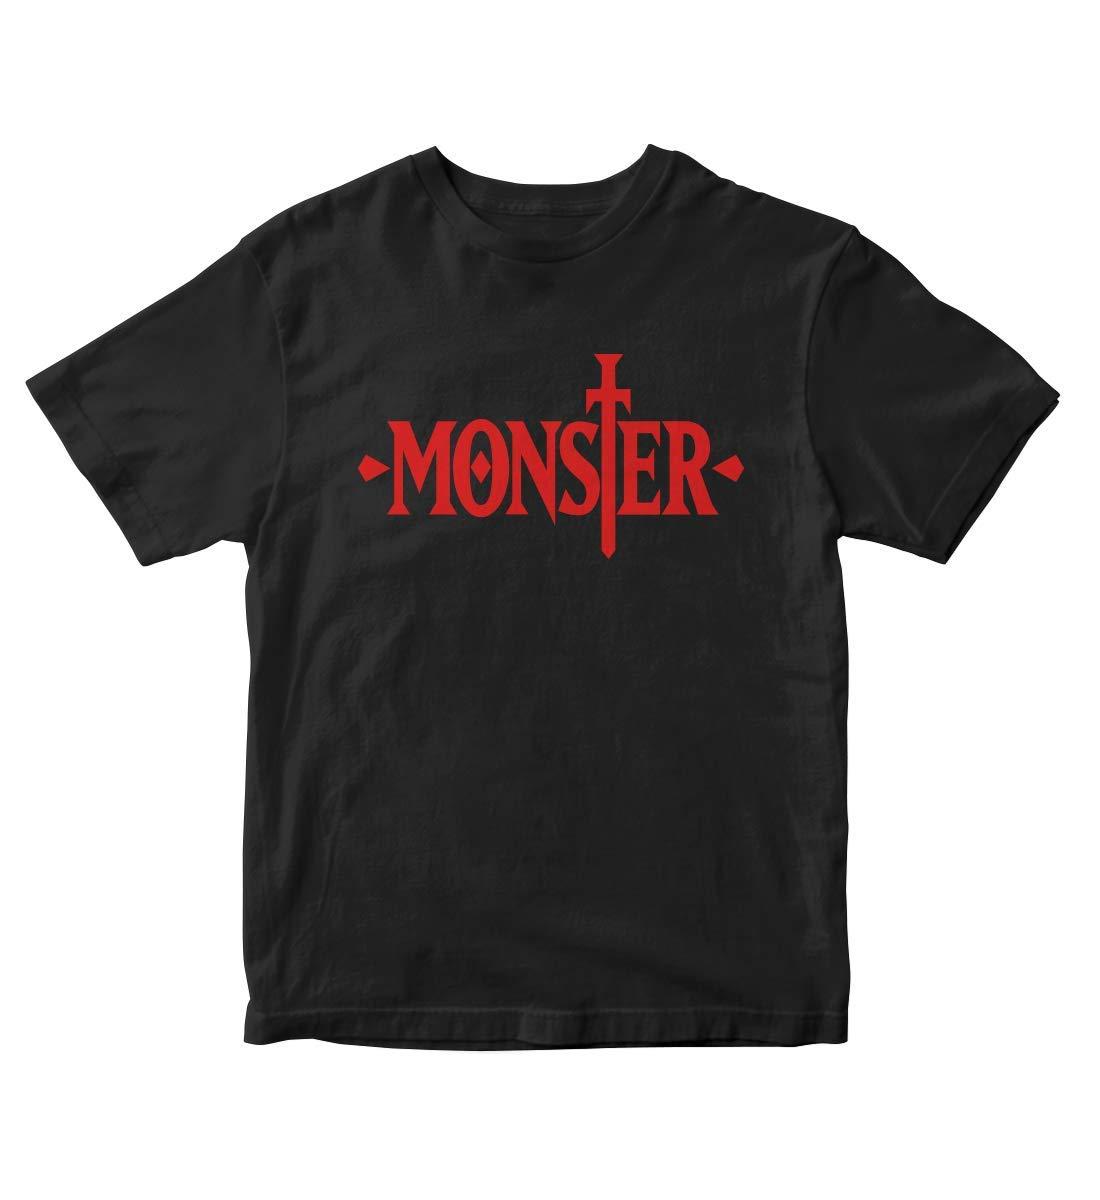 Tjsports Naoki Urasawa Monster Anime Manga Black Shirt S A272